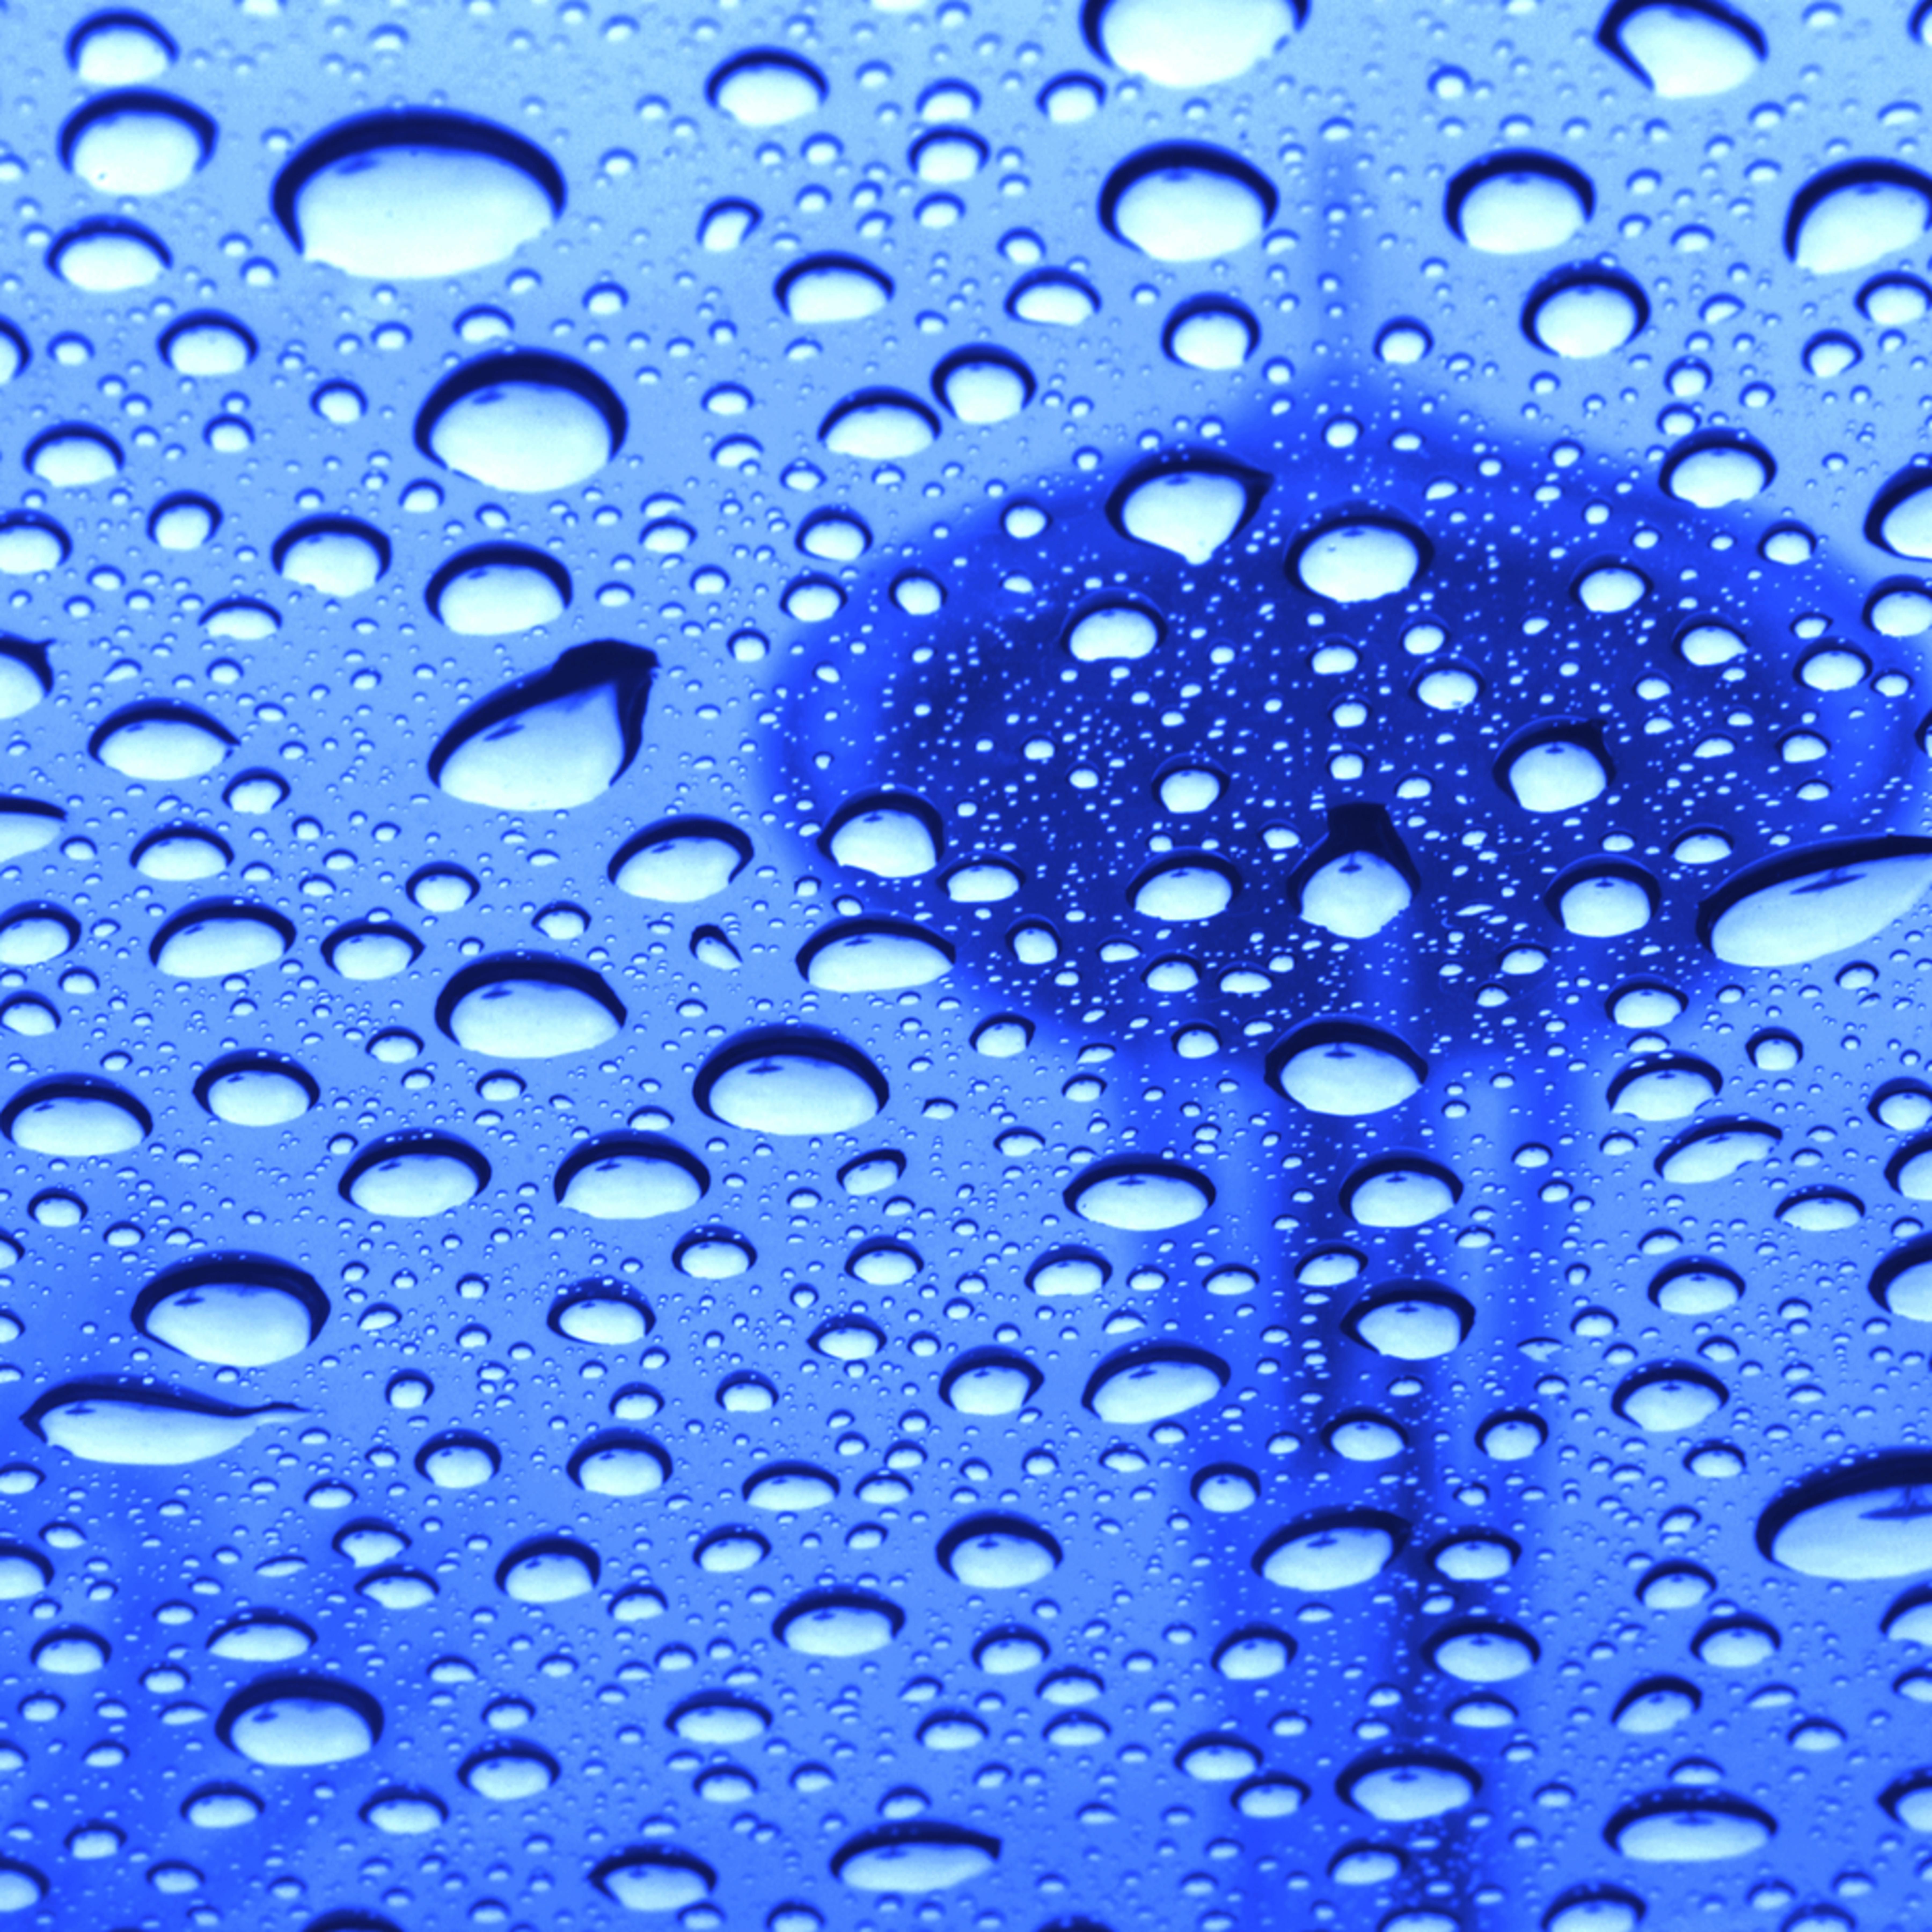 Rainyspaceneedle 20031202031hclx30x36 yzkj7n